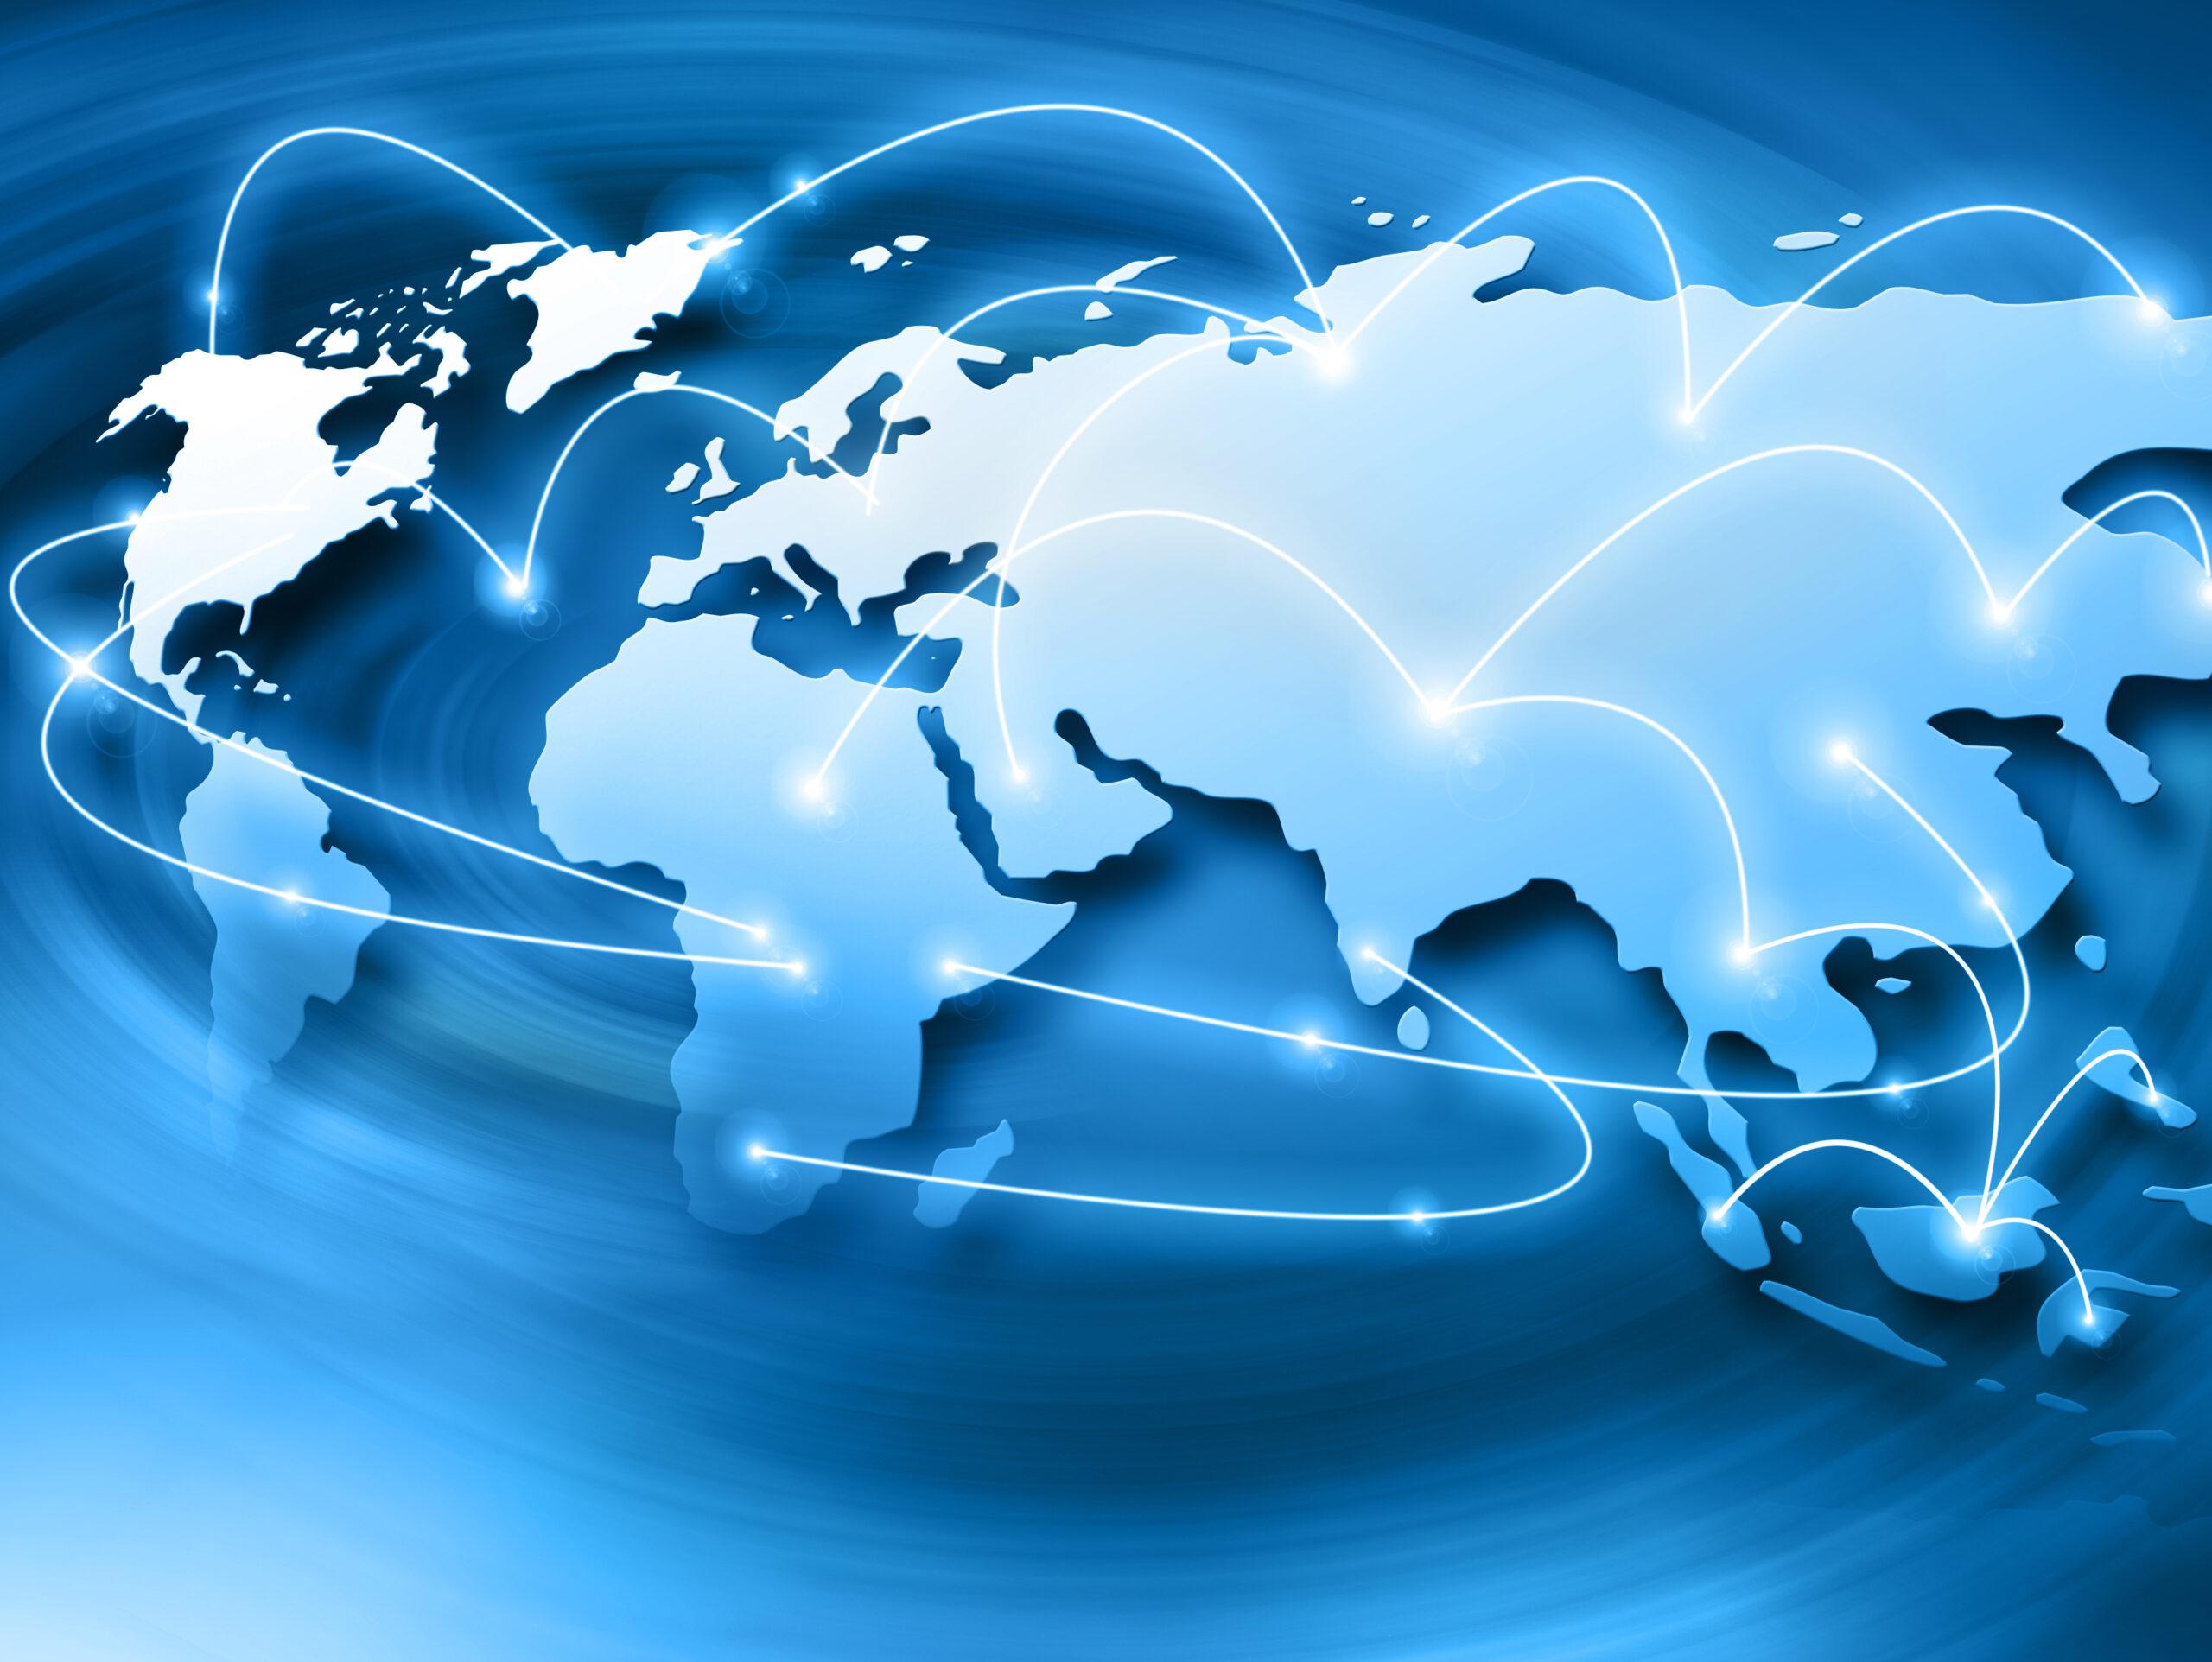 Brokerslink Expands in Balkans with Addition of Broker in Bosnia and Herzegovina